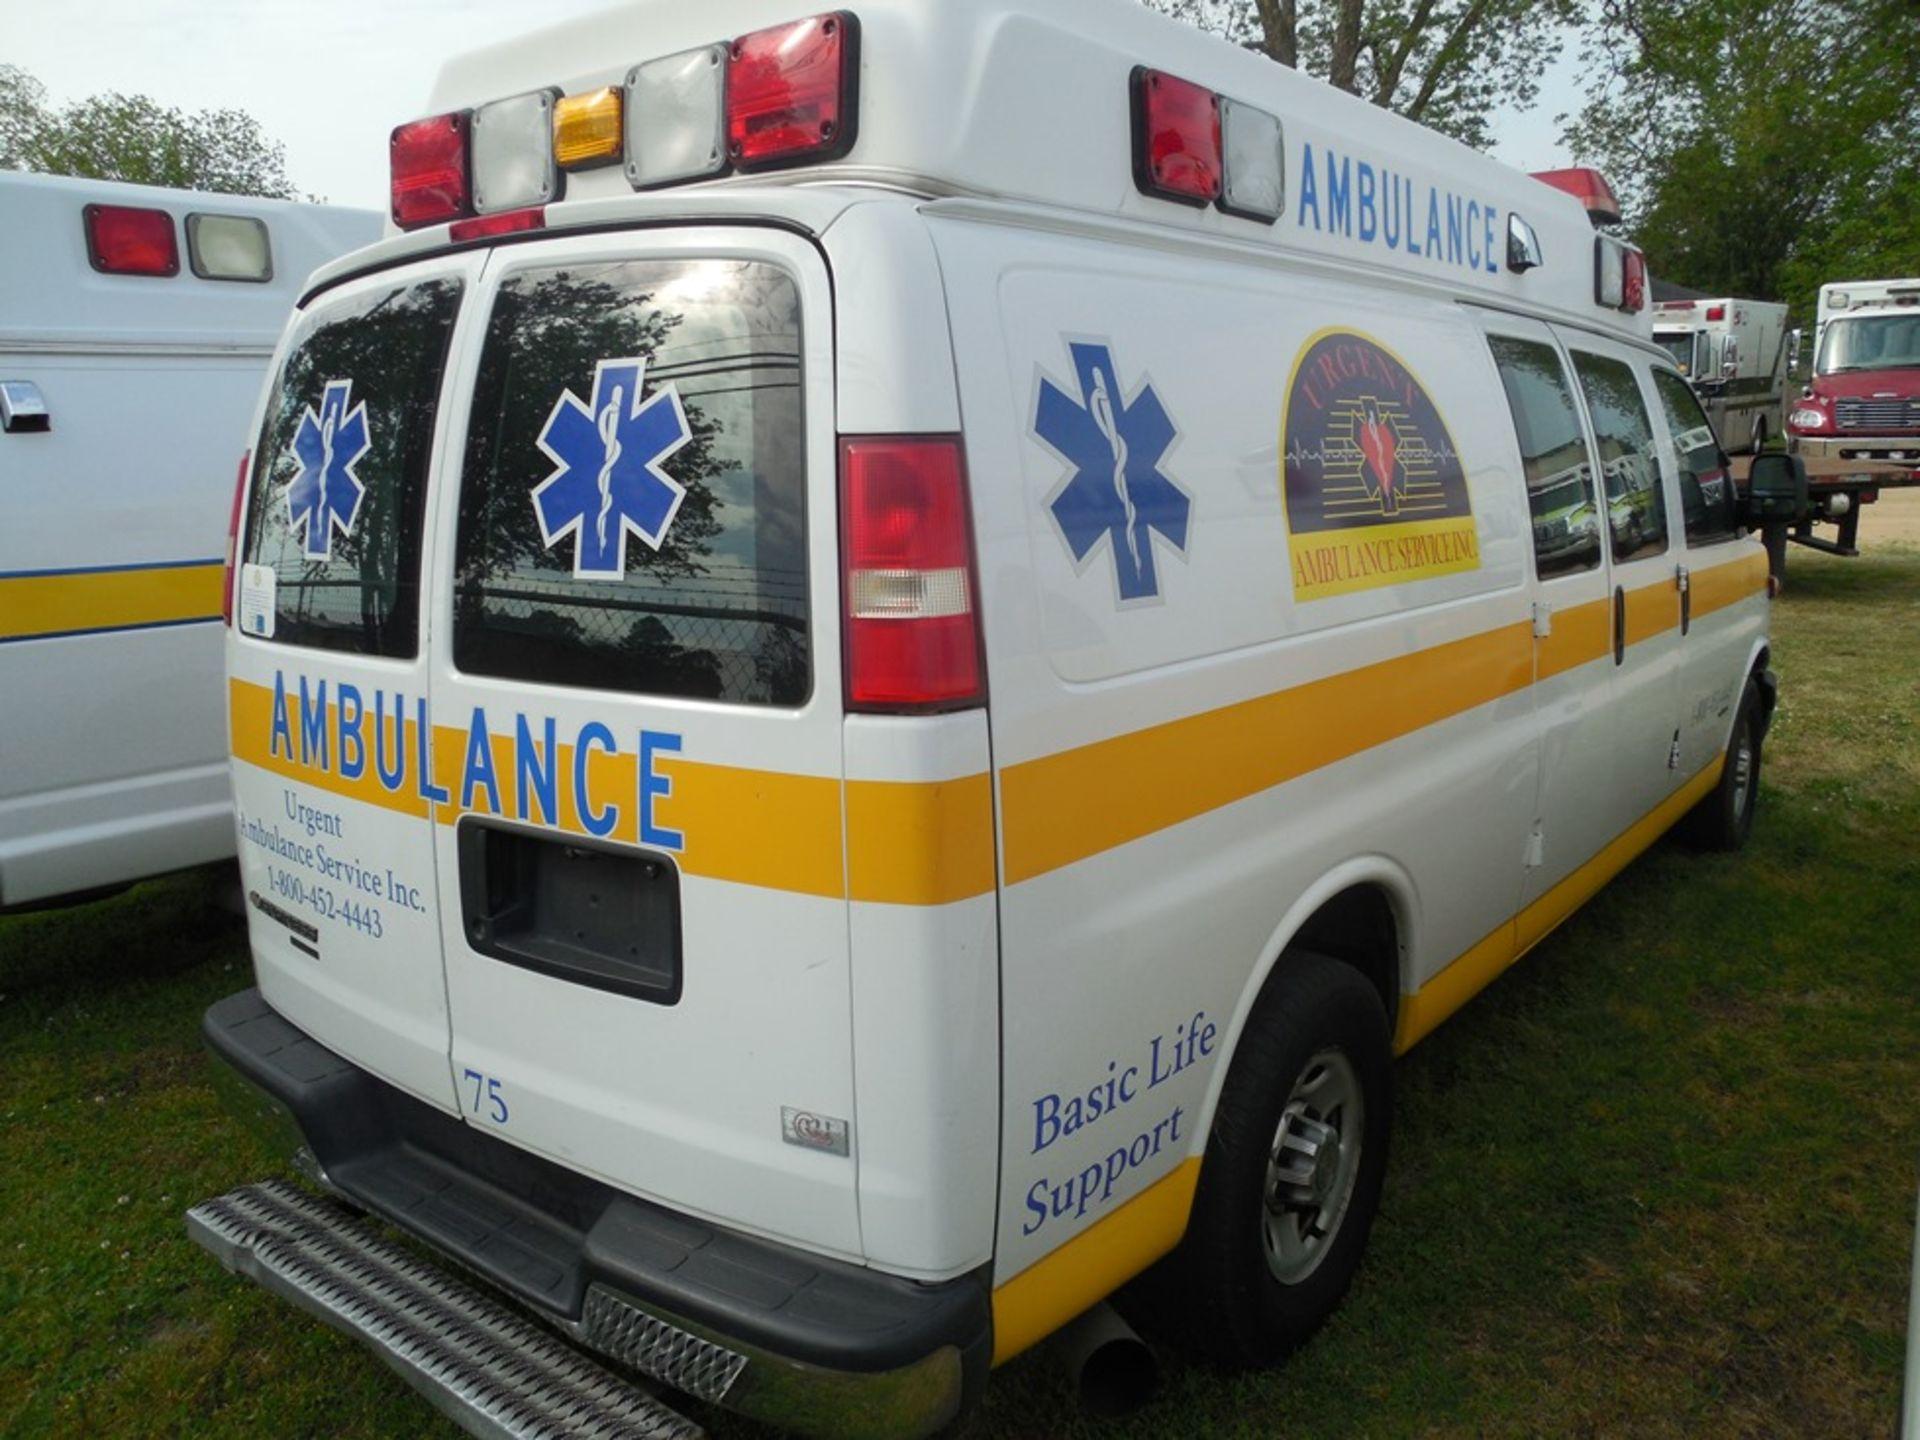 2013 Chev van ambulance dsl, Express Stable Trac 204,709 miles vin# 1GBZGUC13D1130018 - Image 4 of 6